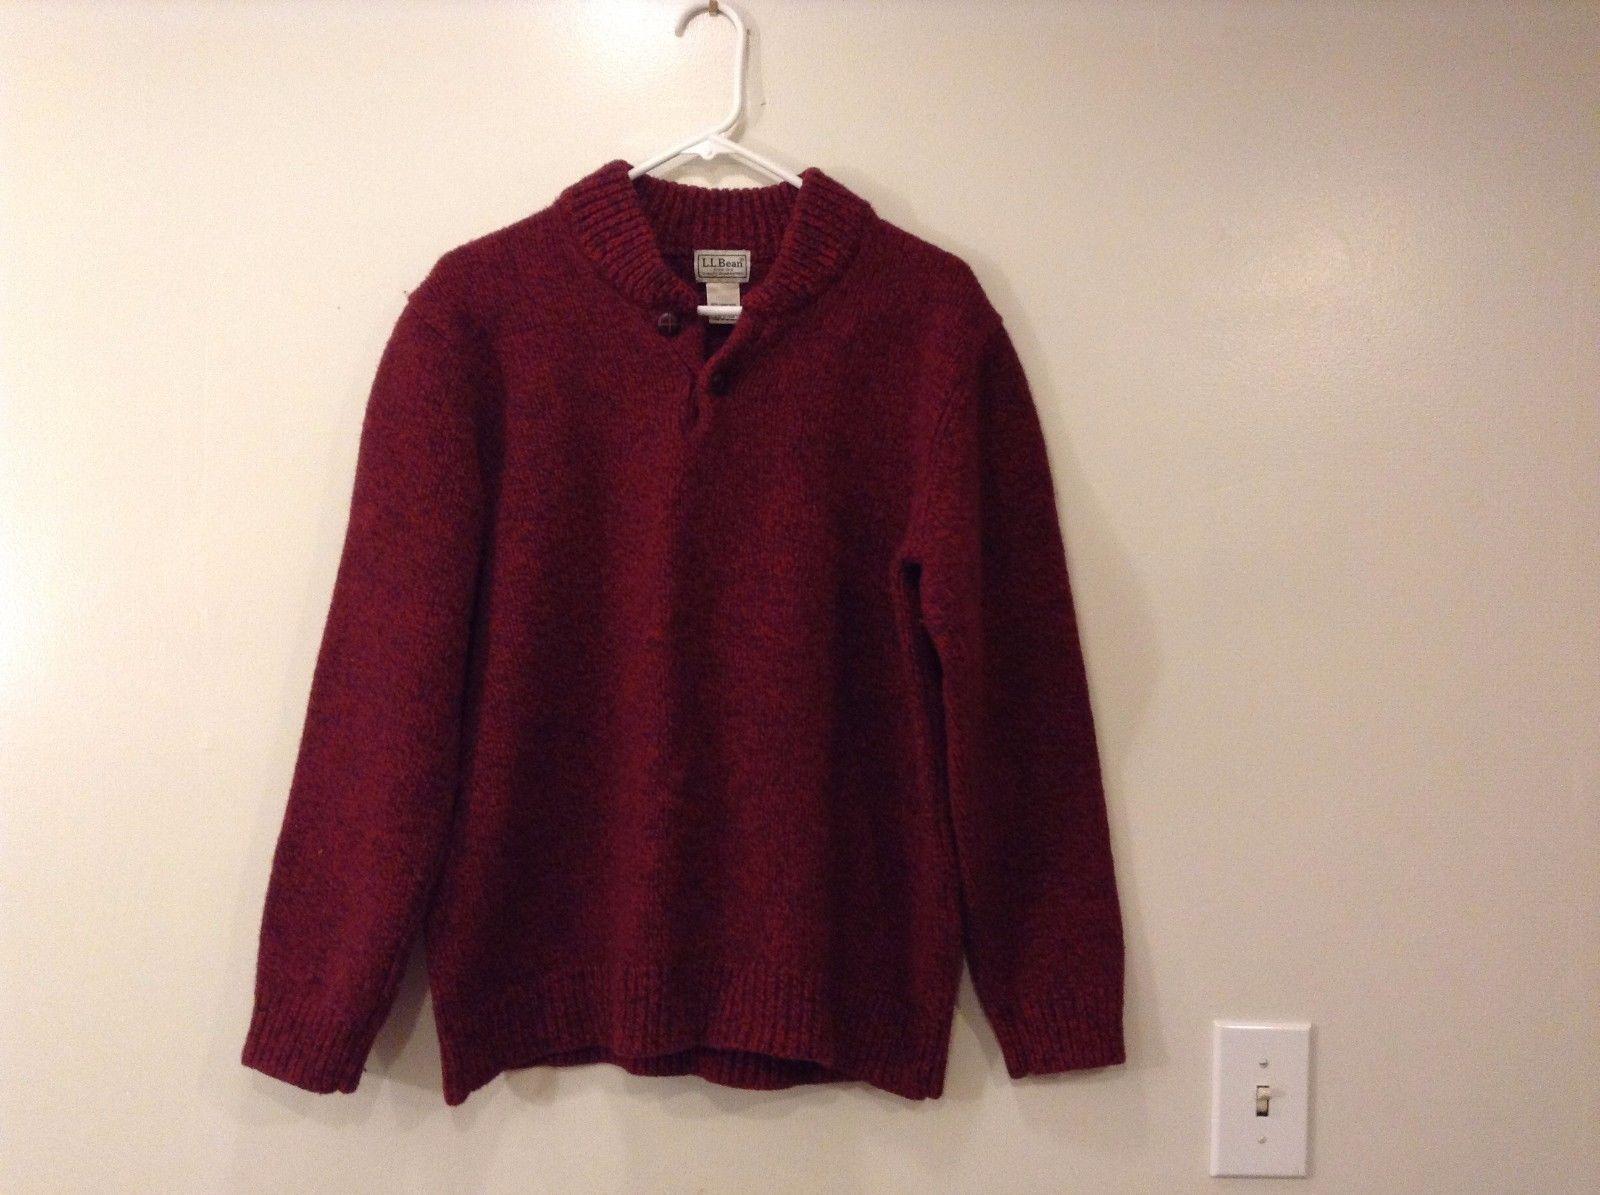 Mens L.L. Bean Dark Red 100% Lambs Wool Sweater Size L Tall Two Buttons